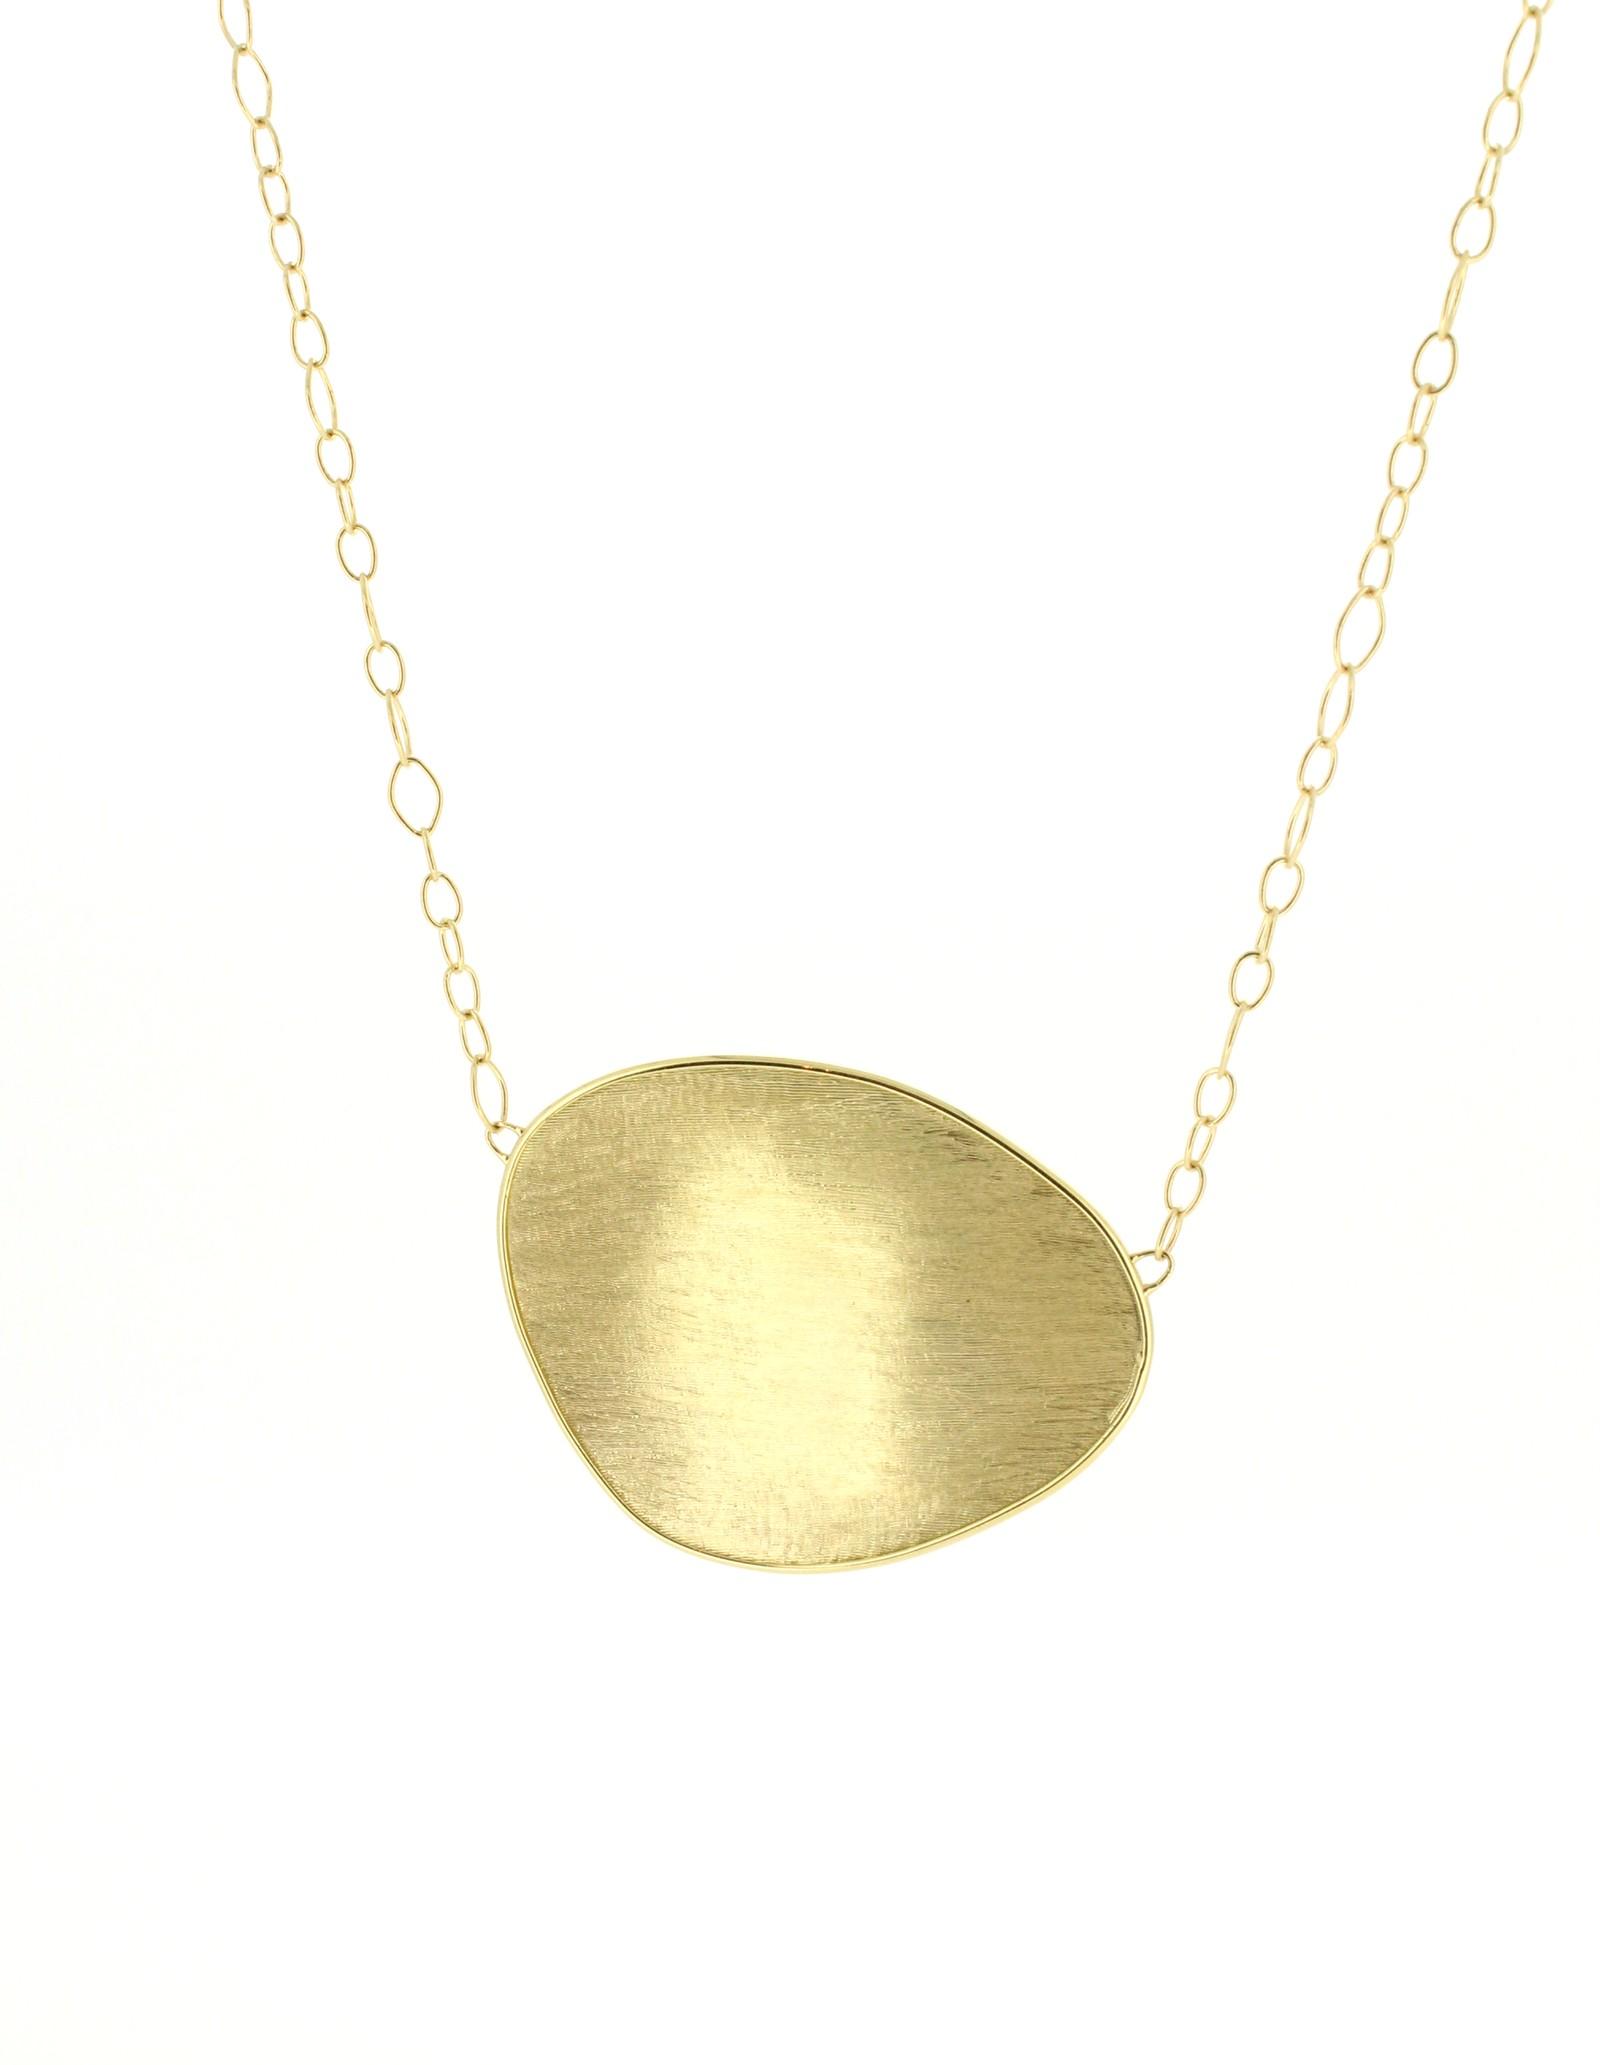 Kette Lunaria 18ct Gold - Marco Bicego - CB1770